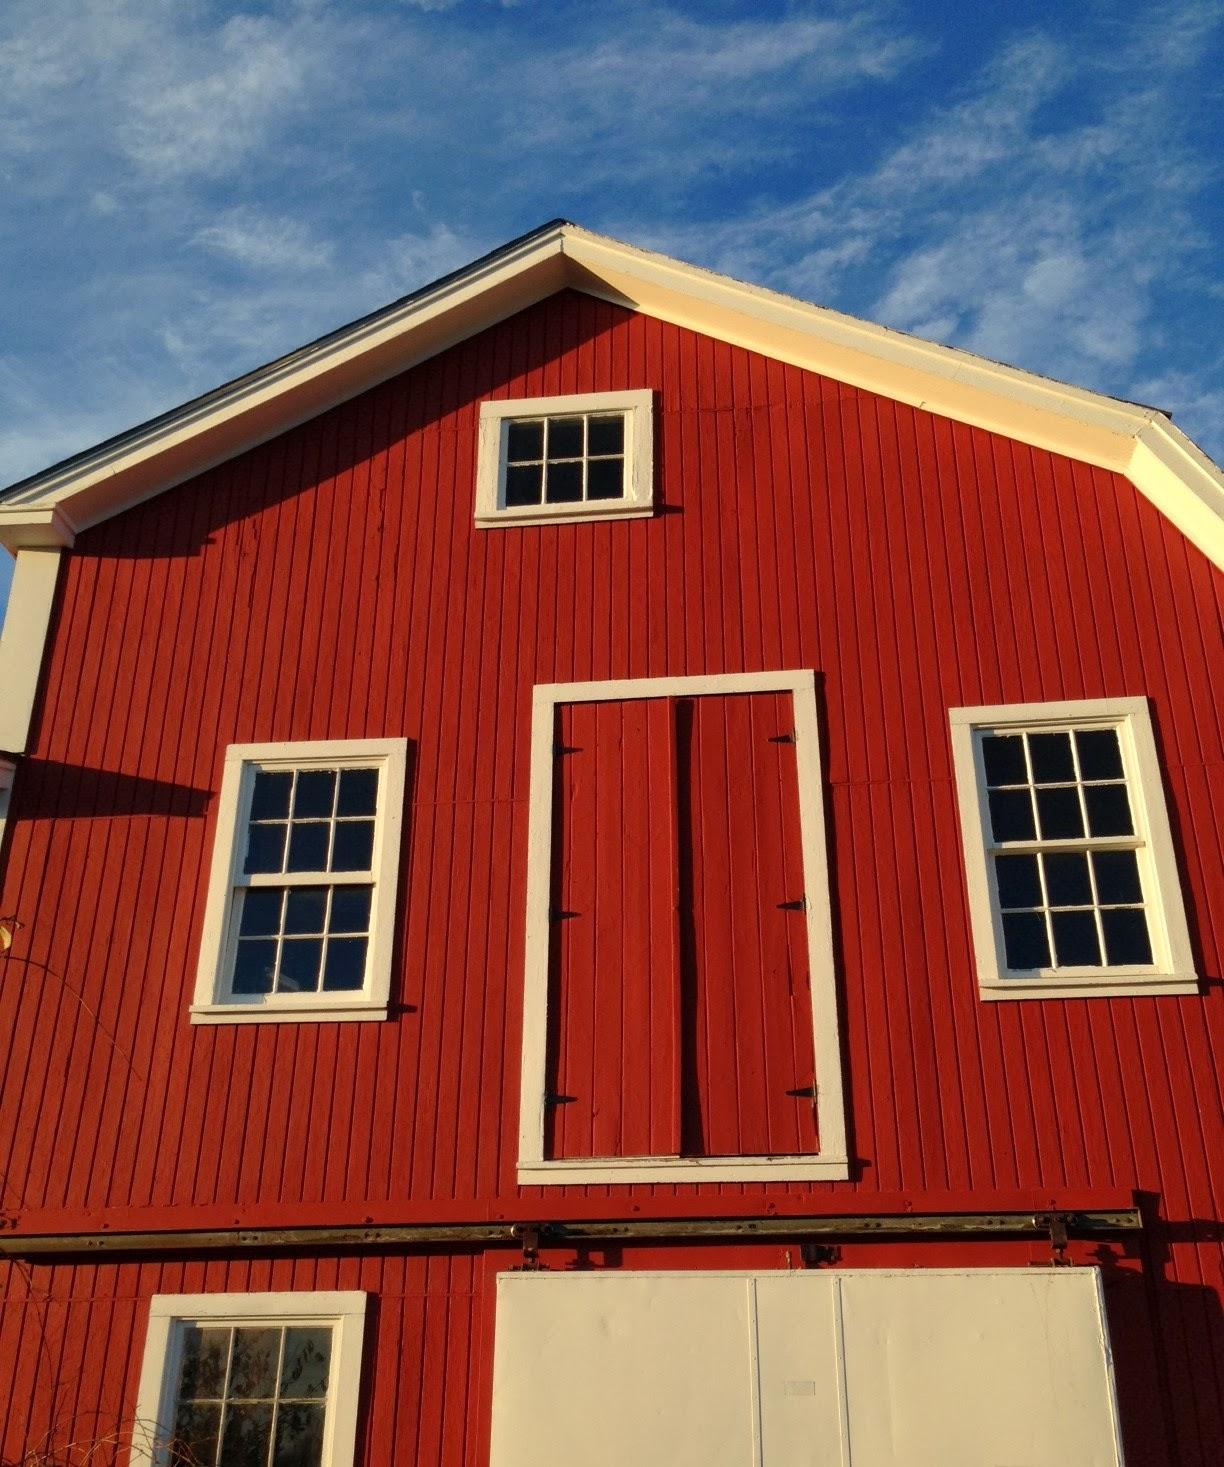 Cricket Acres Studio: Barn Sale